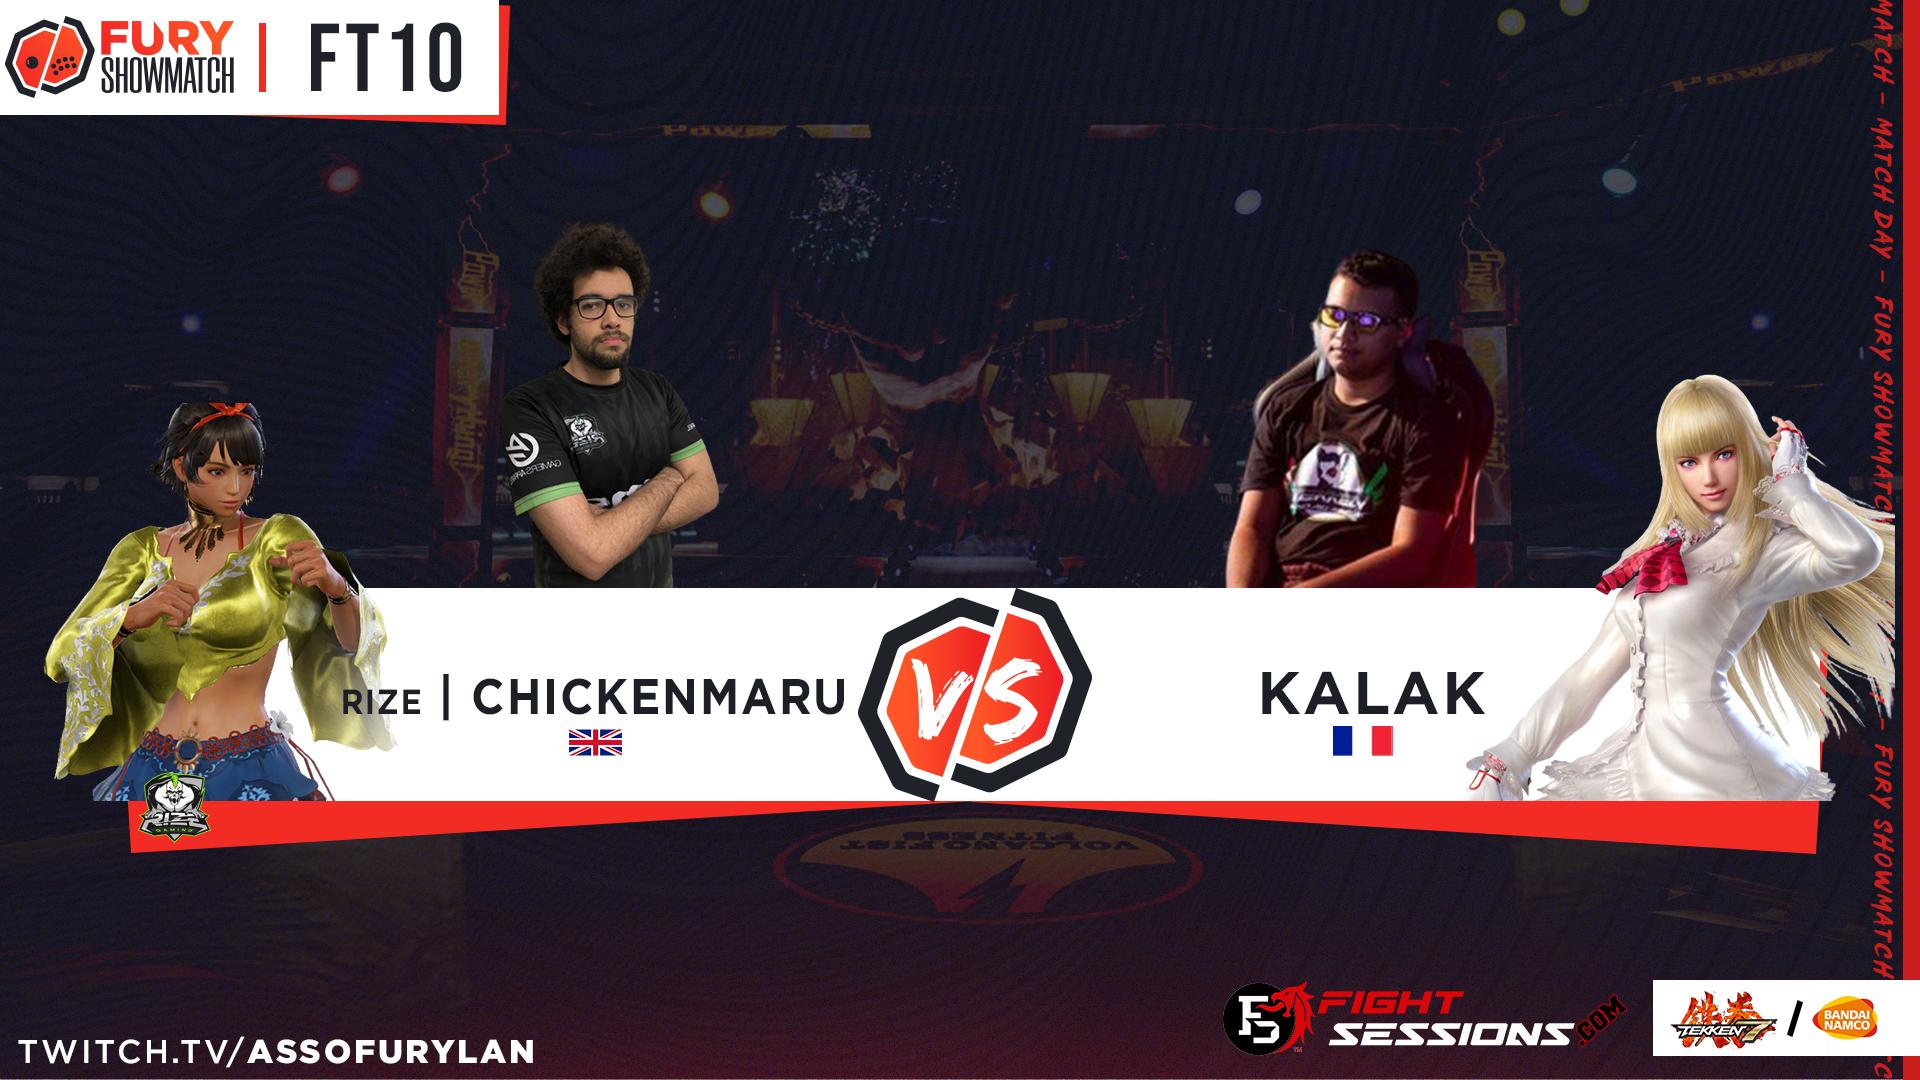 FT10 - Chickenmaru vs kalak